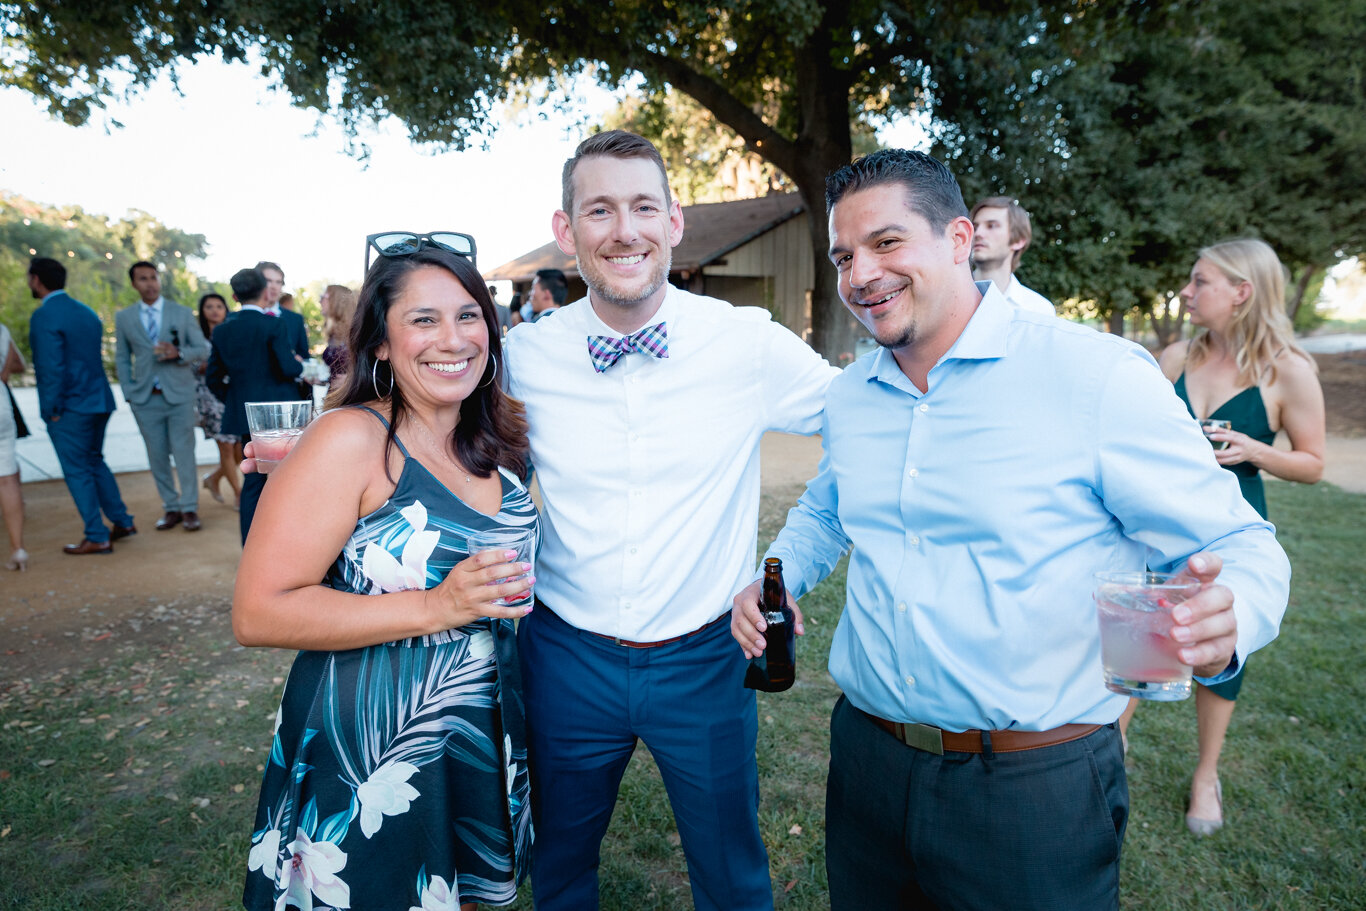 2019.08.24_Emily-Ashir-Wedding-at-the-Maples-6124.jpg